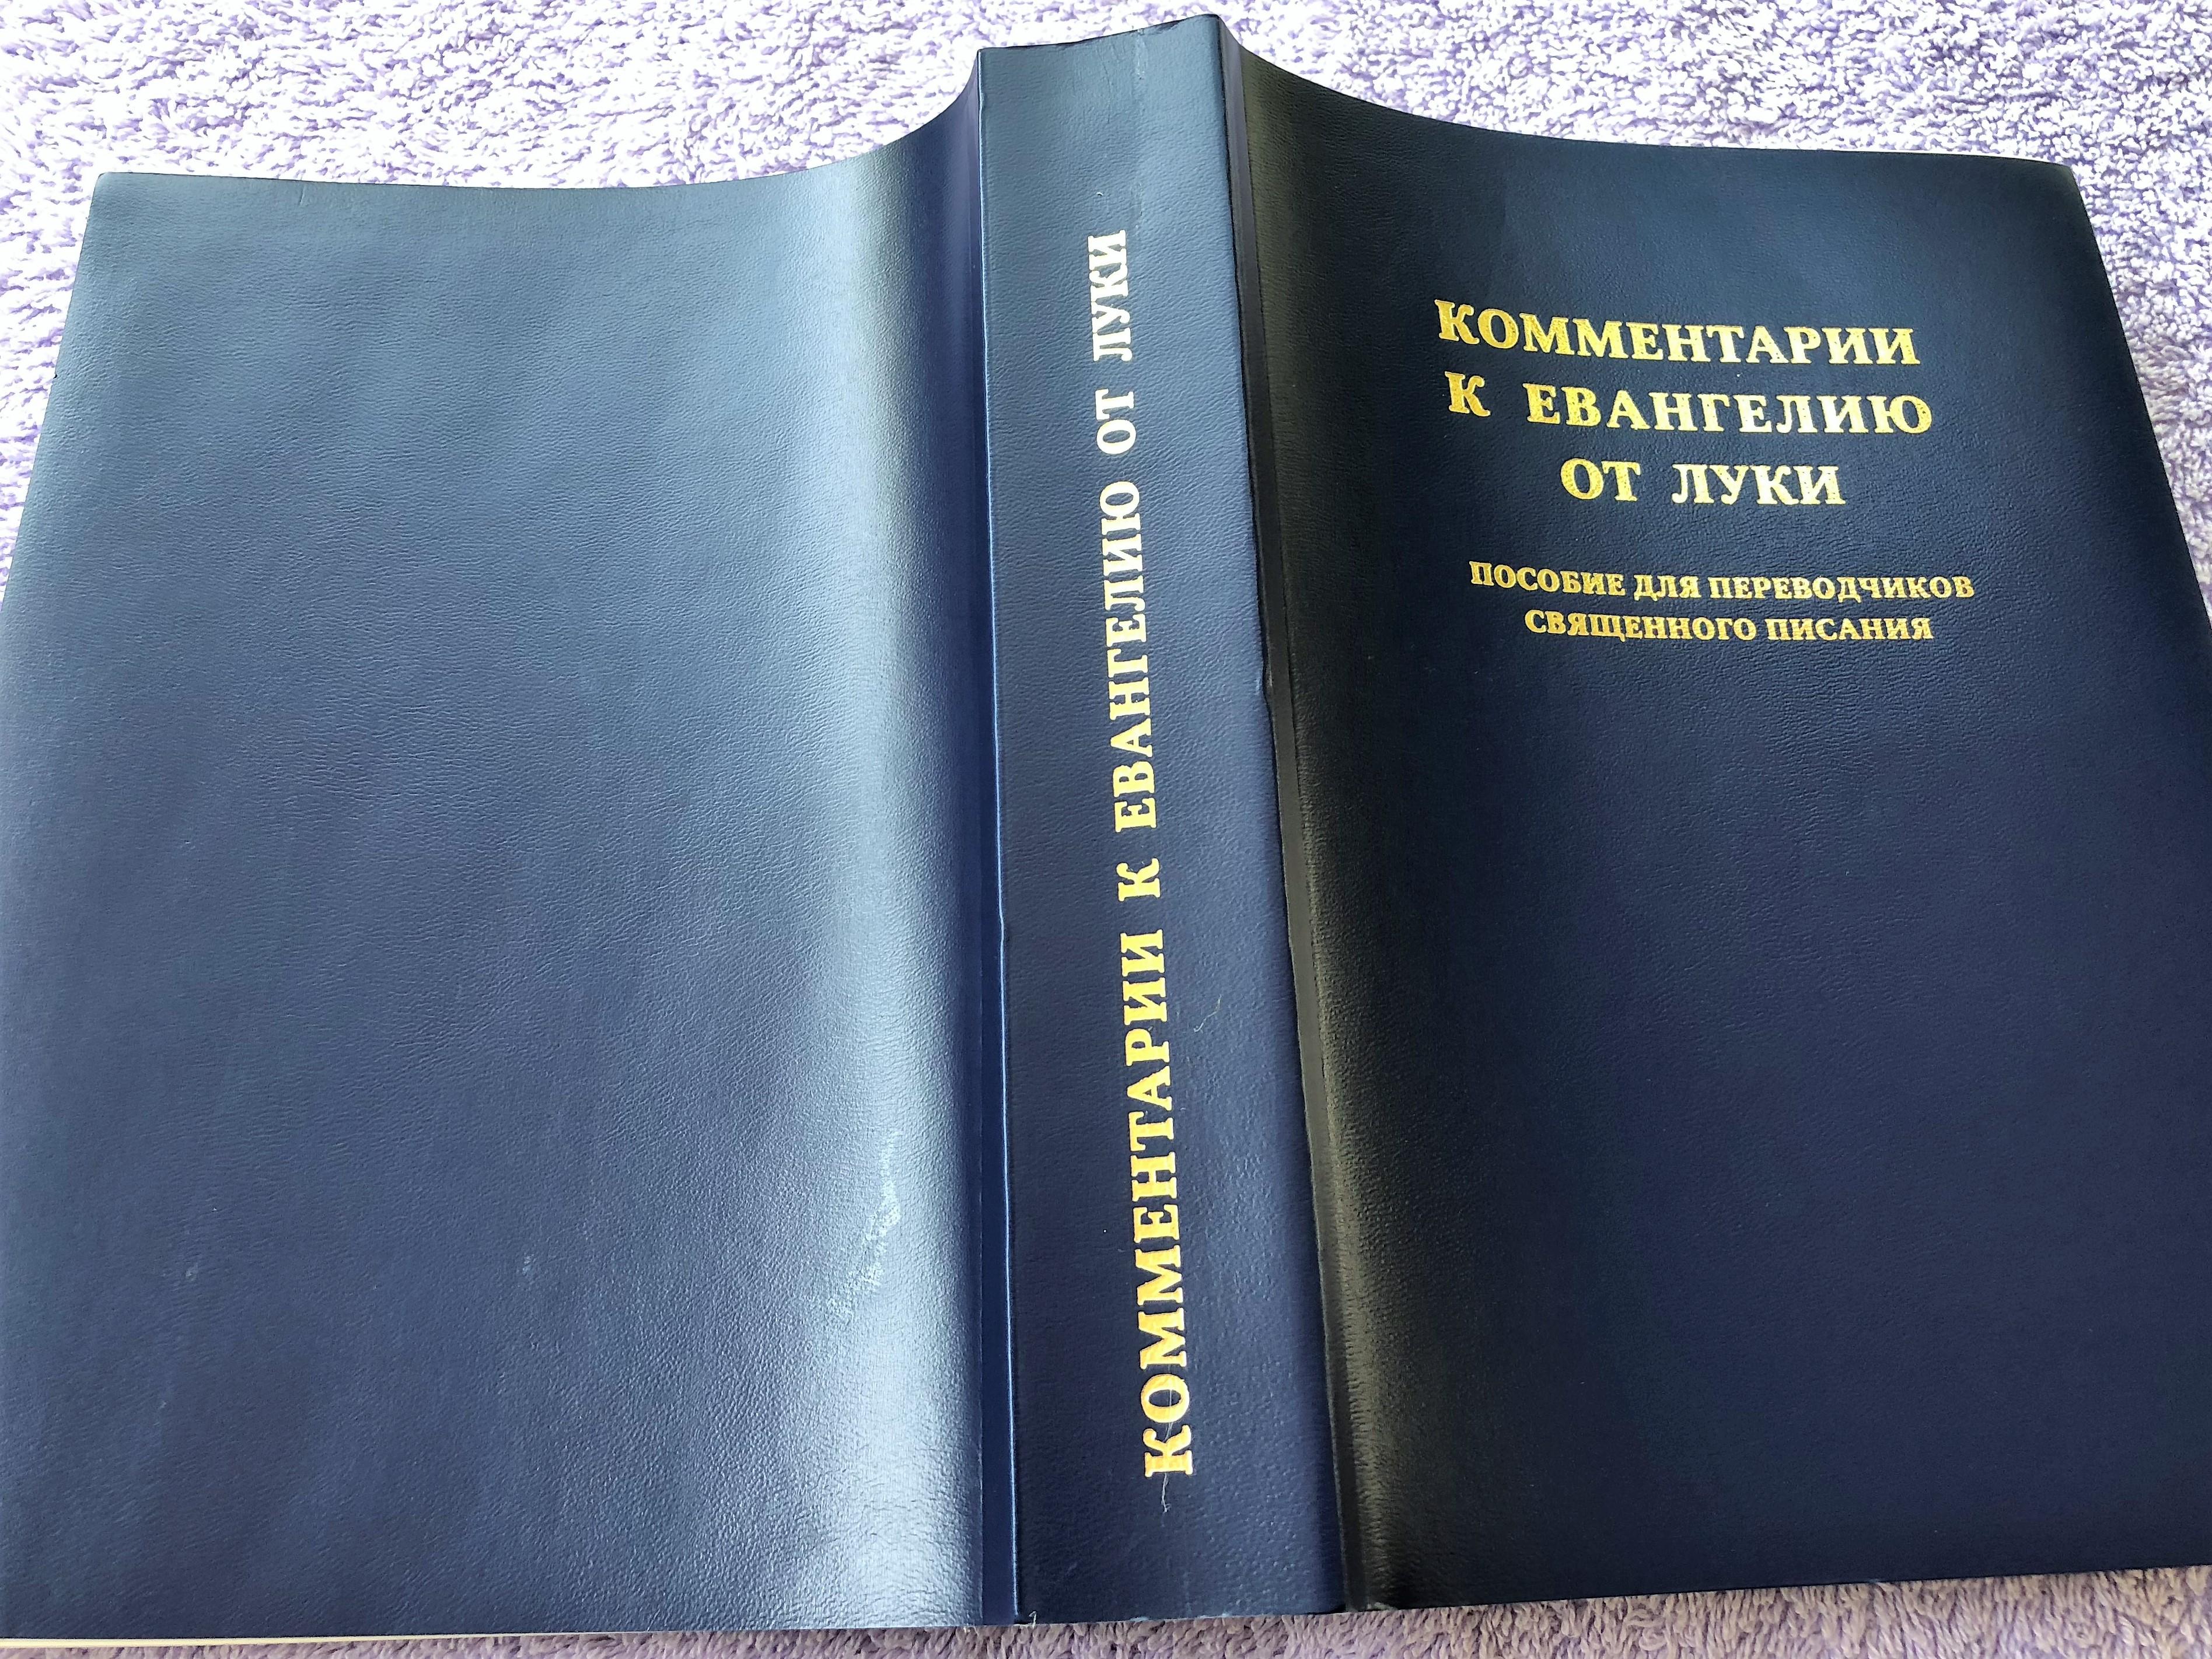 russian-language-edition-of-the-helps-for-bible-translators-a-translator-s-handbook-on-the-gospel-of-luke-17-.jpg